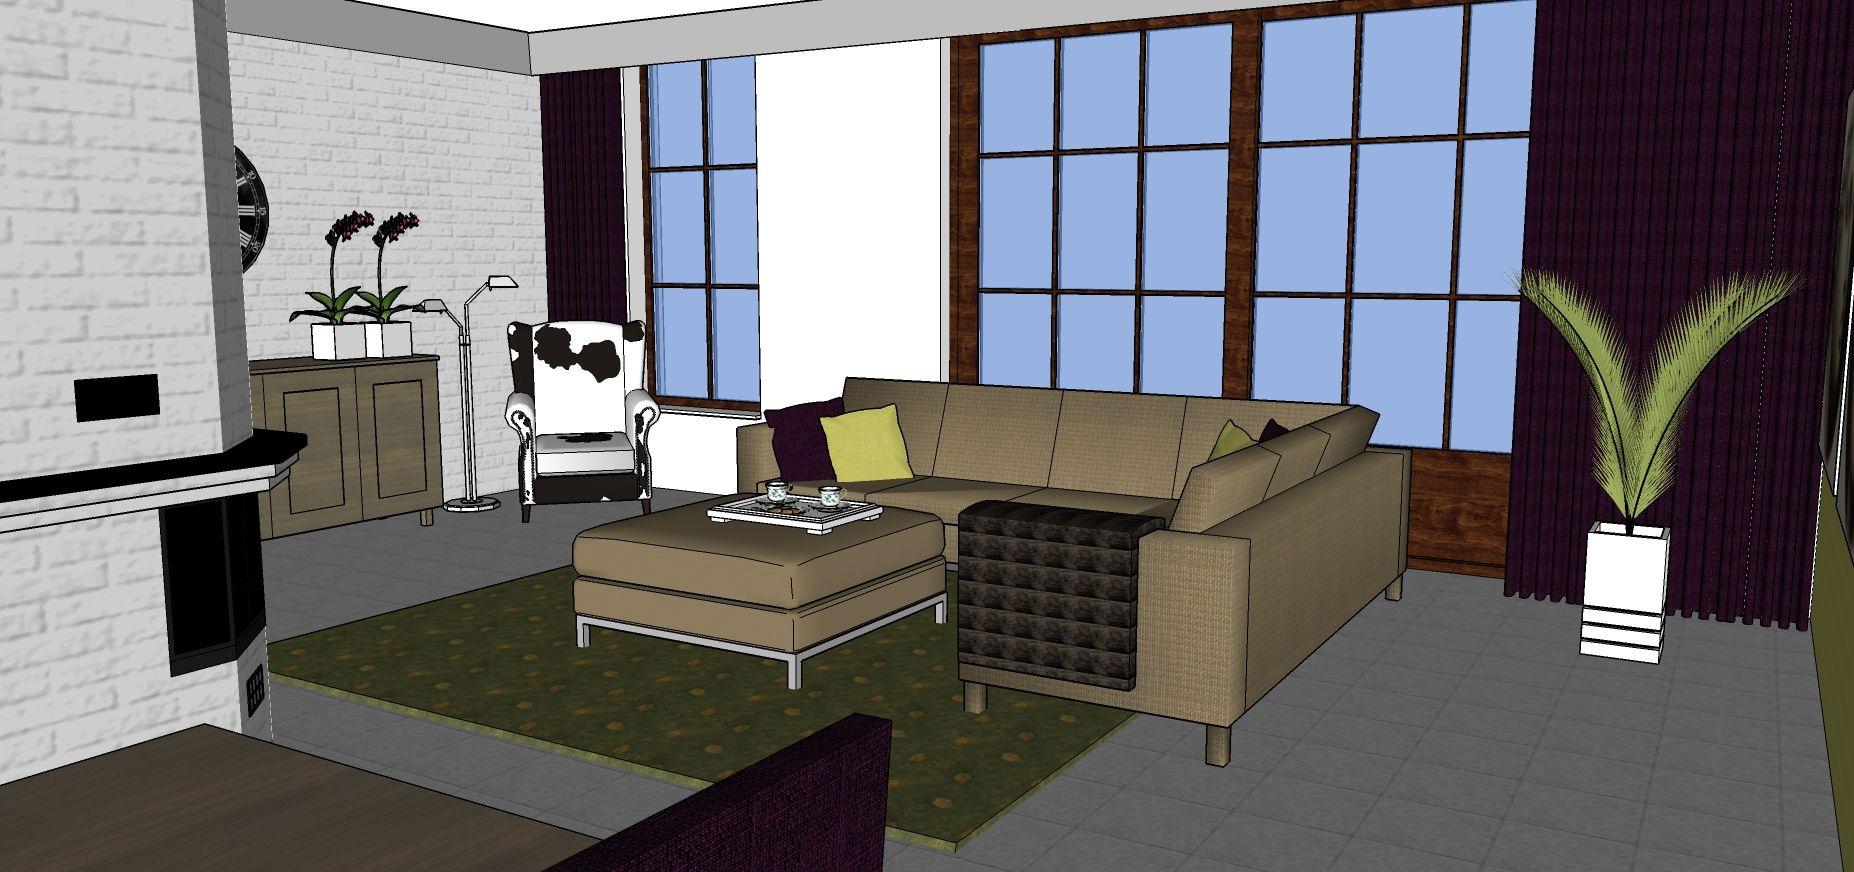 Afbeeldingsresultaat voor indeling l vormige woonkamer   Idee Steur ...